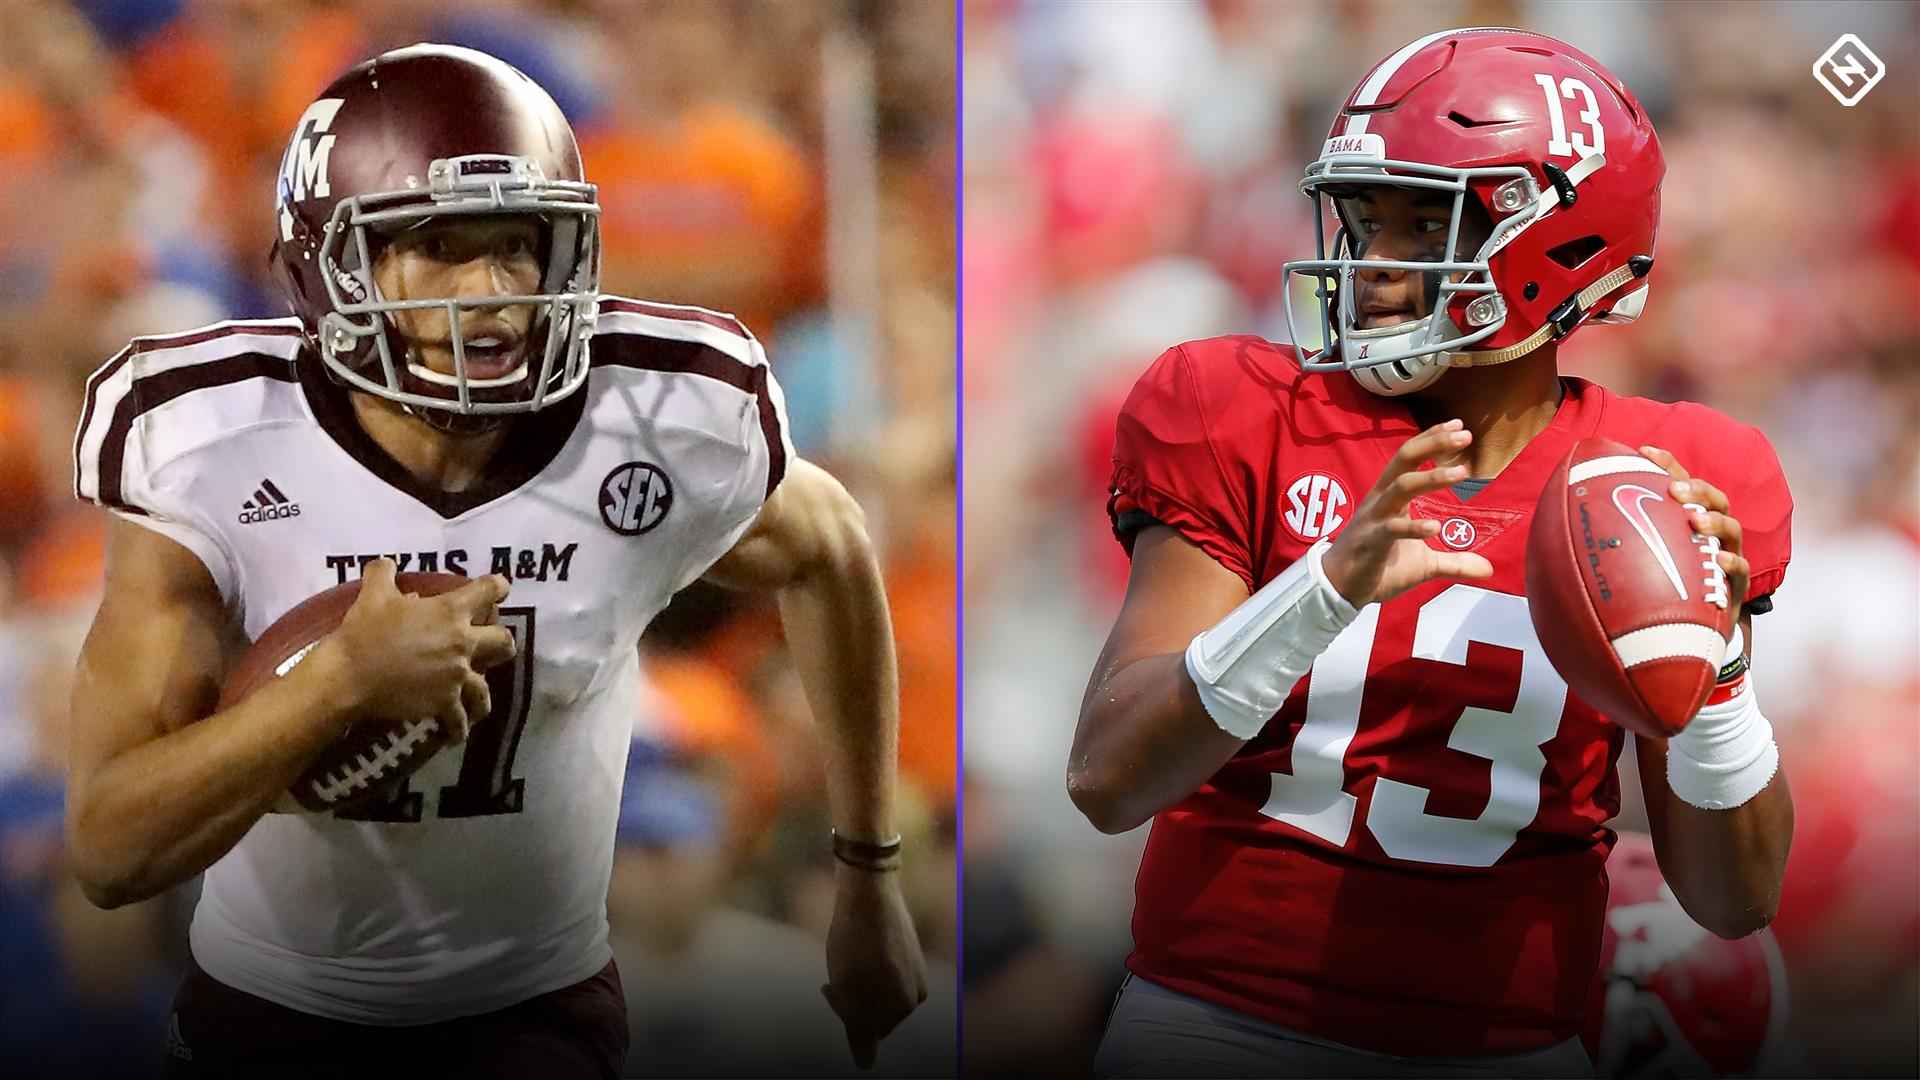 2013 NCAA Football - Week 6 Betting Picks Against Spread